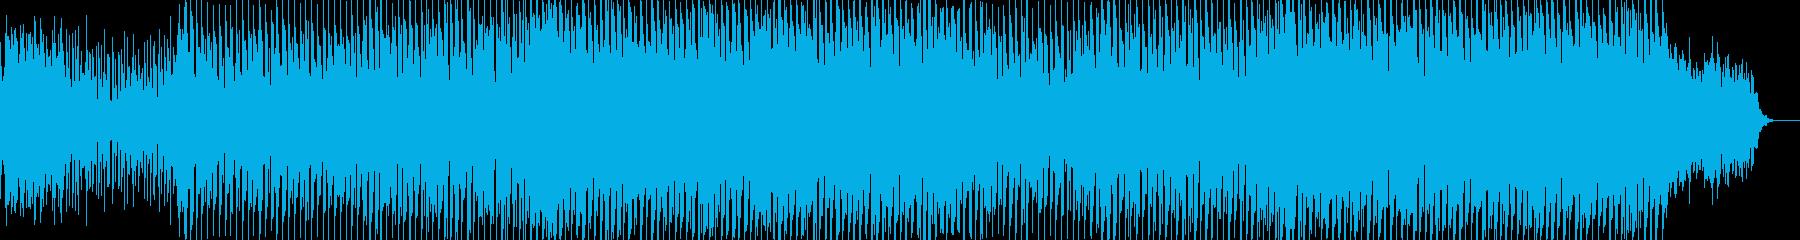 EDMポップで明るいクラブ系-118の再生済みの波形